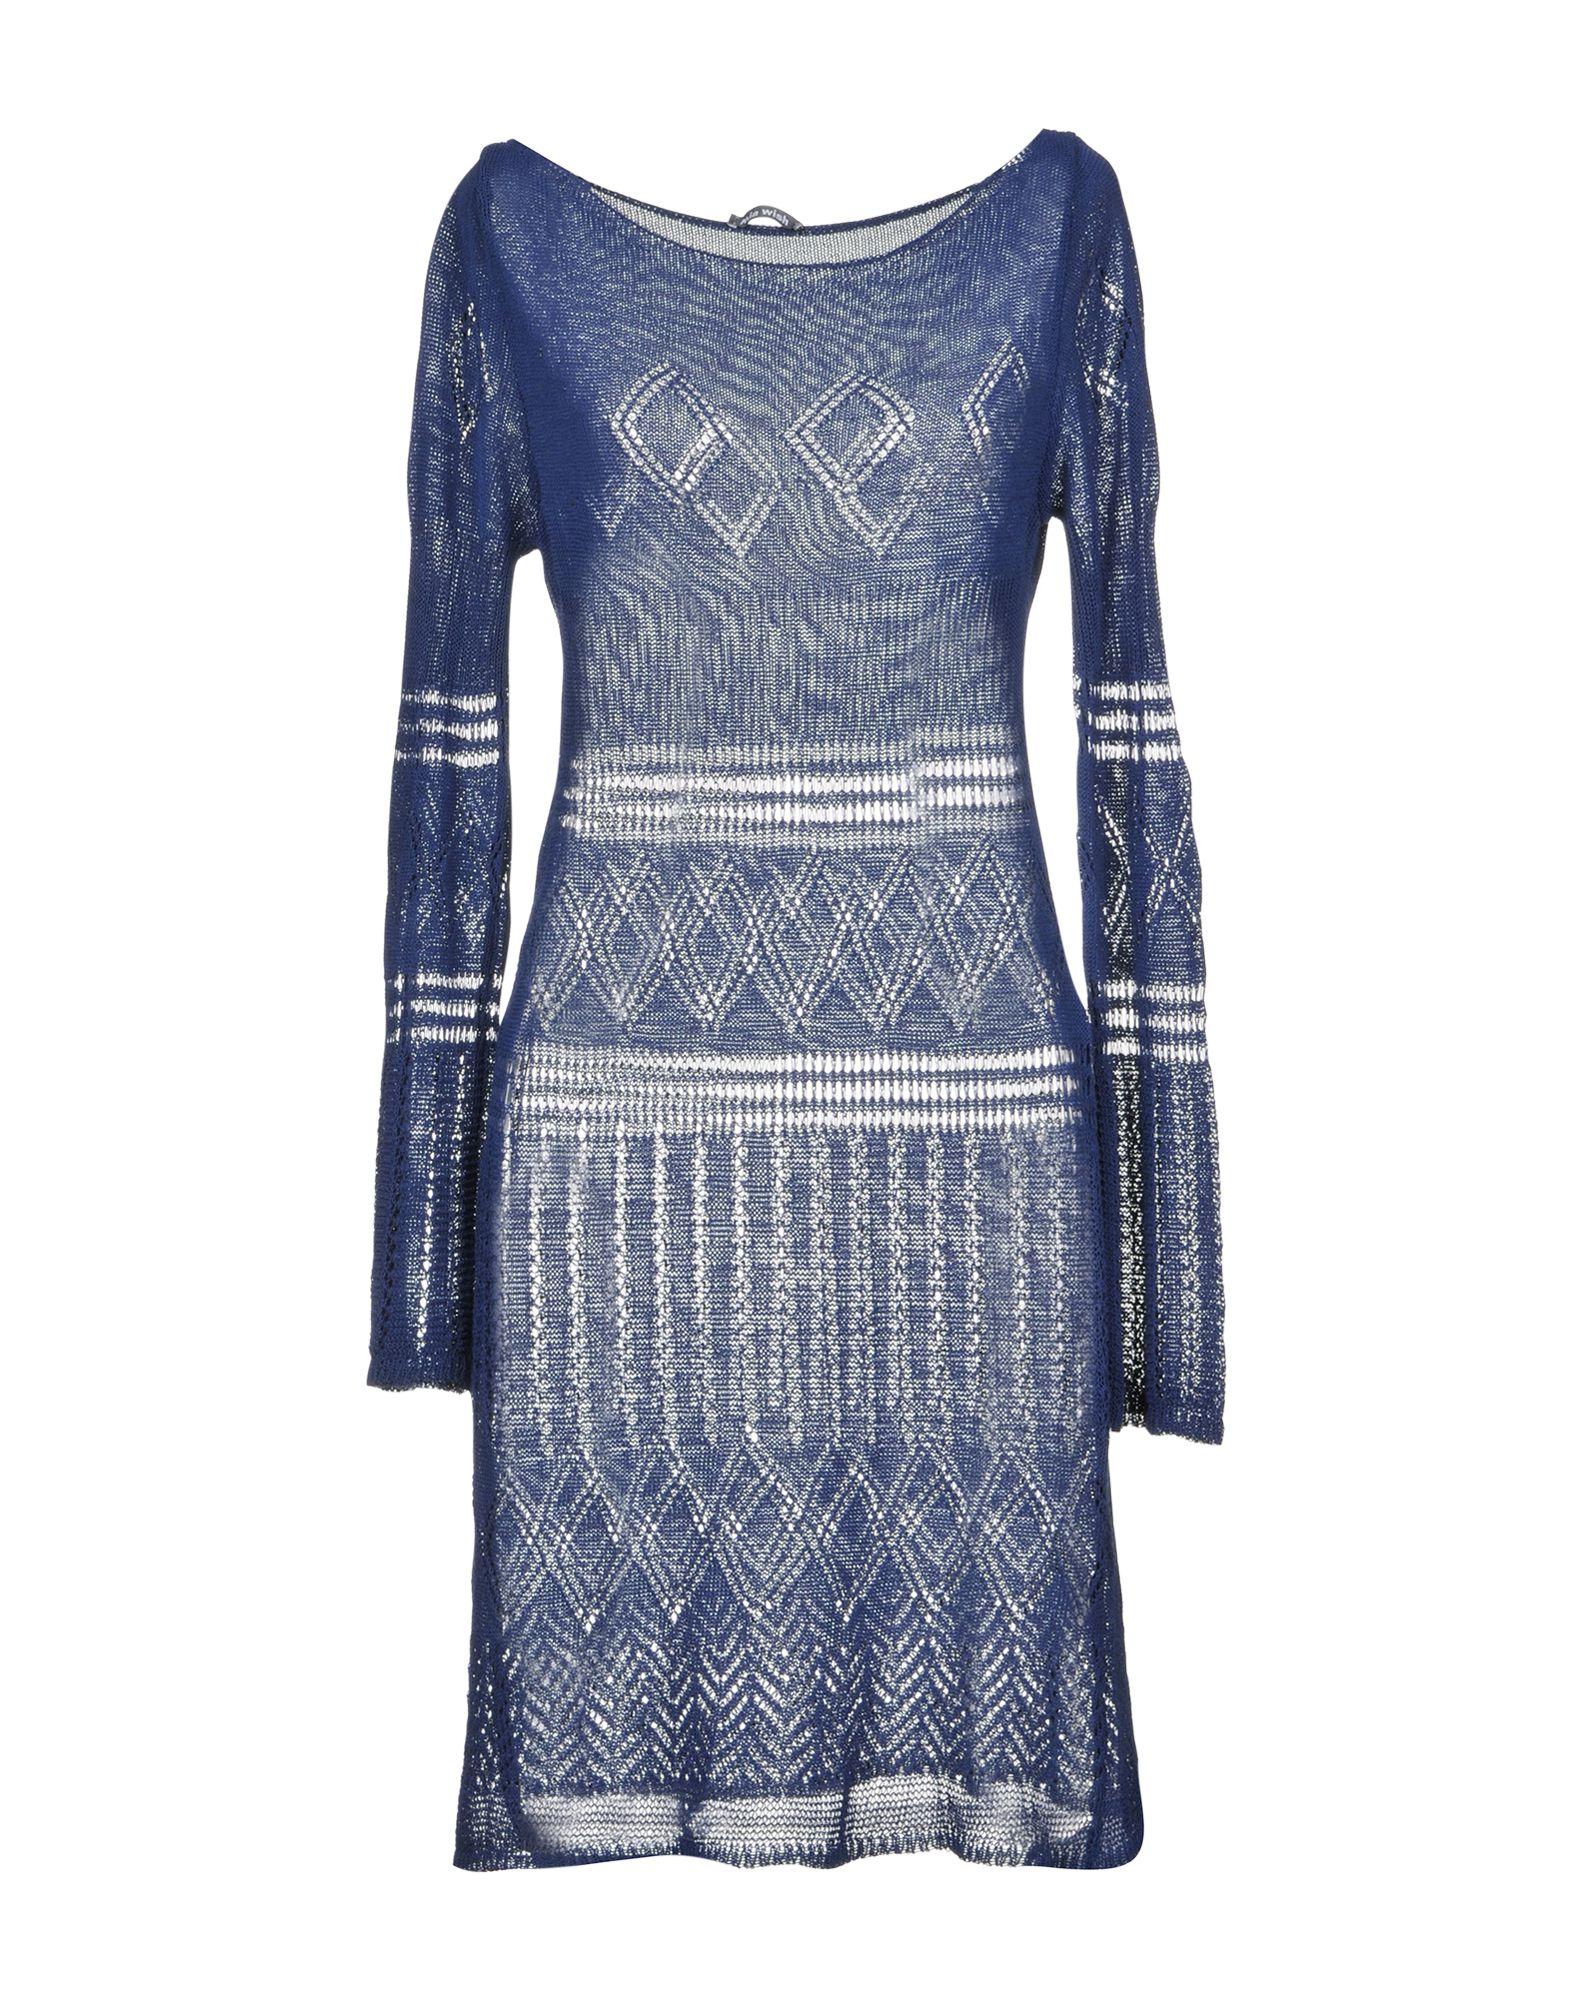 MIA WISH Короткое платье туники сарафаны mia mia платье leona цвет синий s